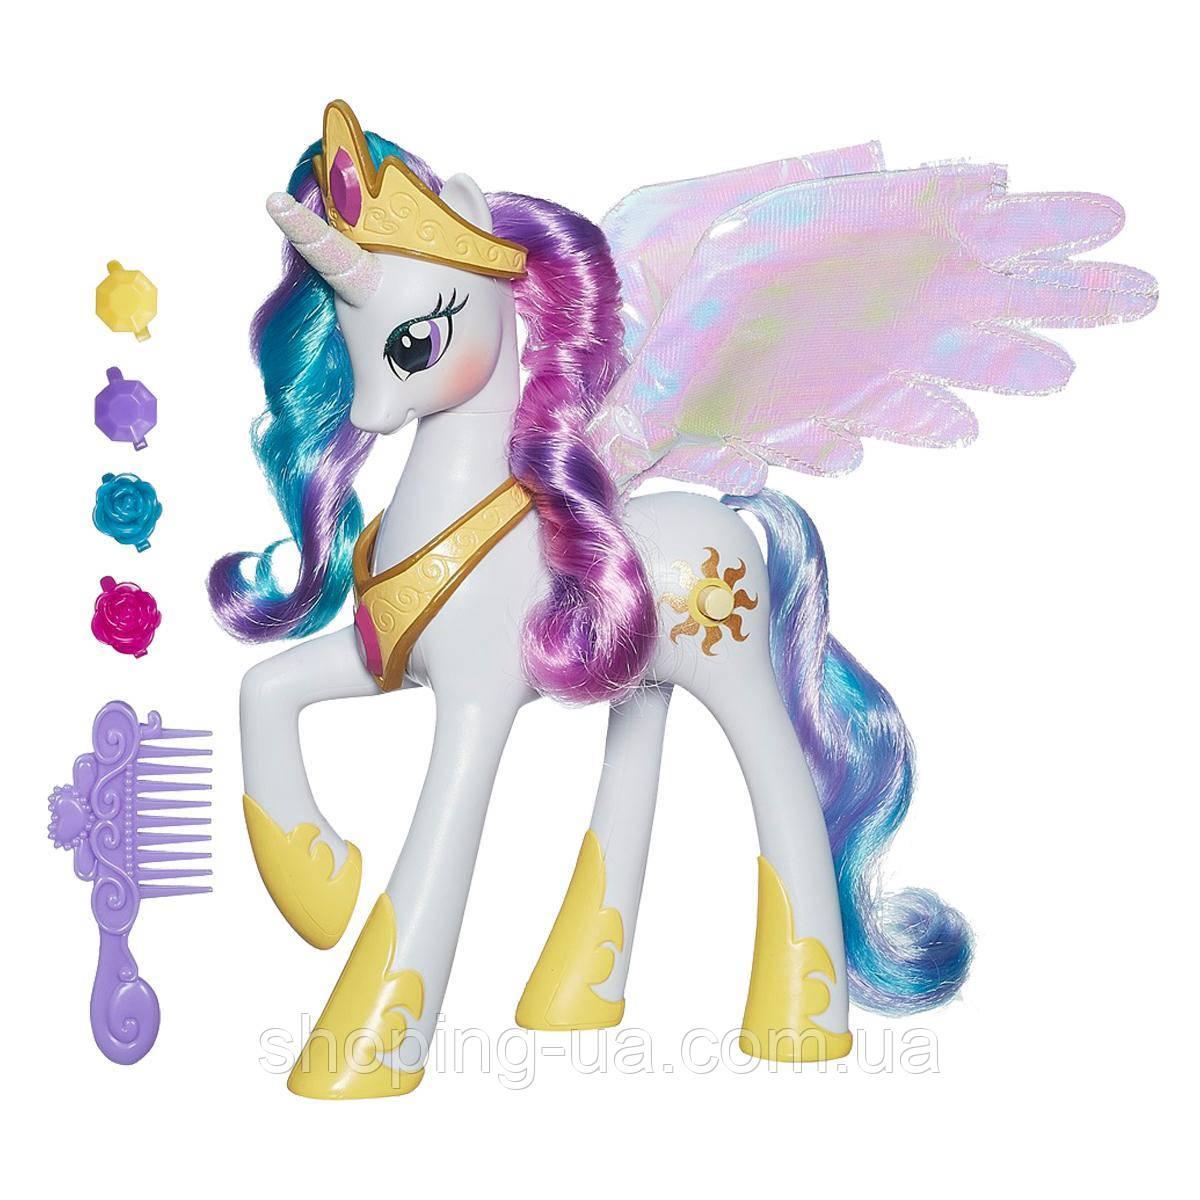 My little Pony Пони Принцесса Селестия Hasbro A0633, фото 1